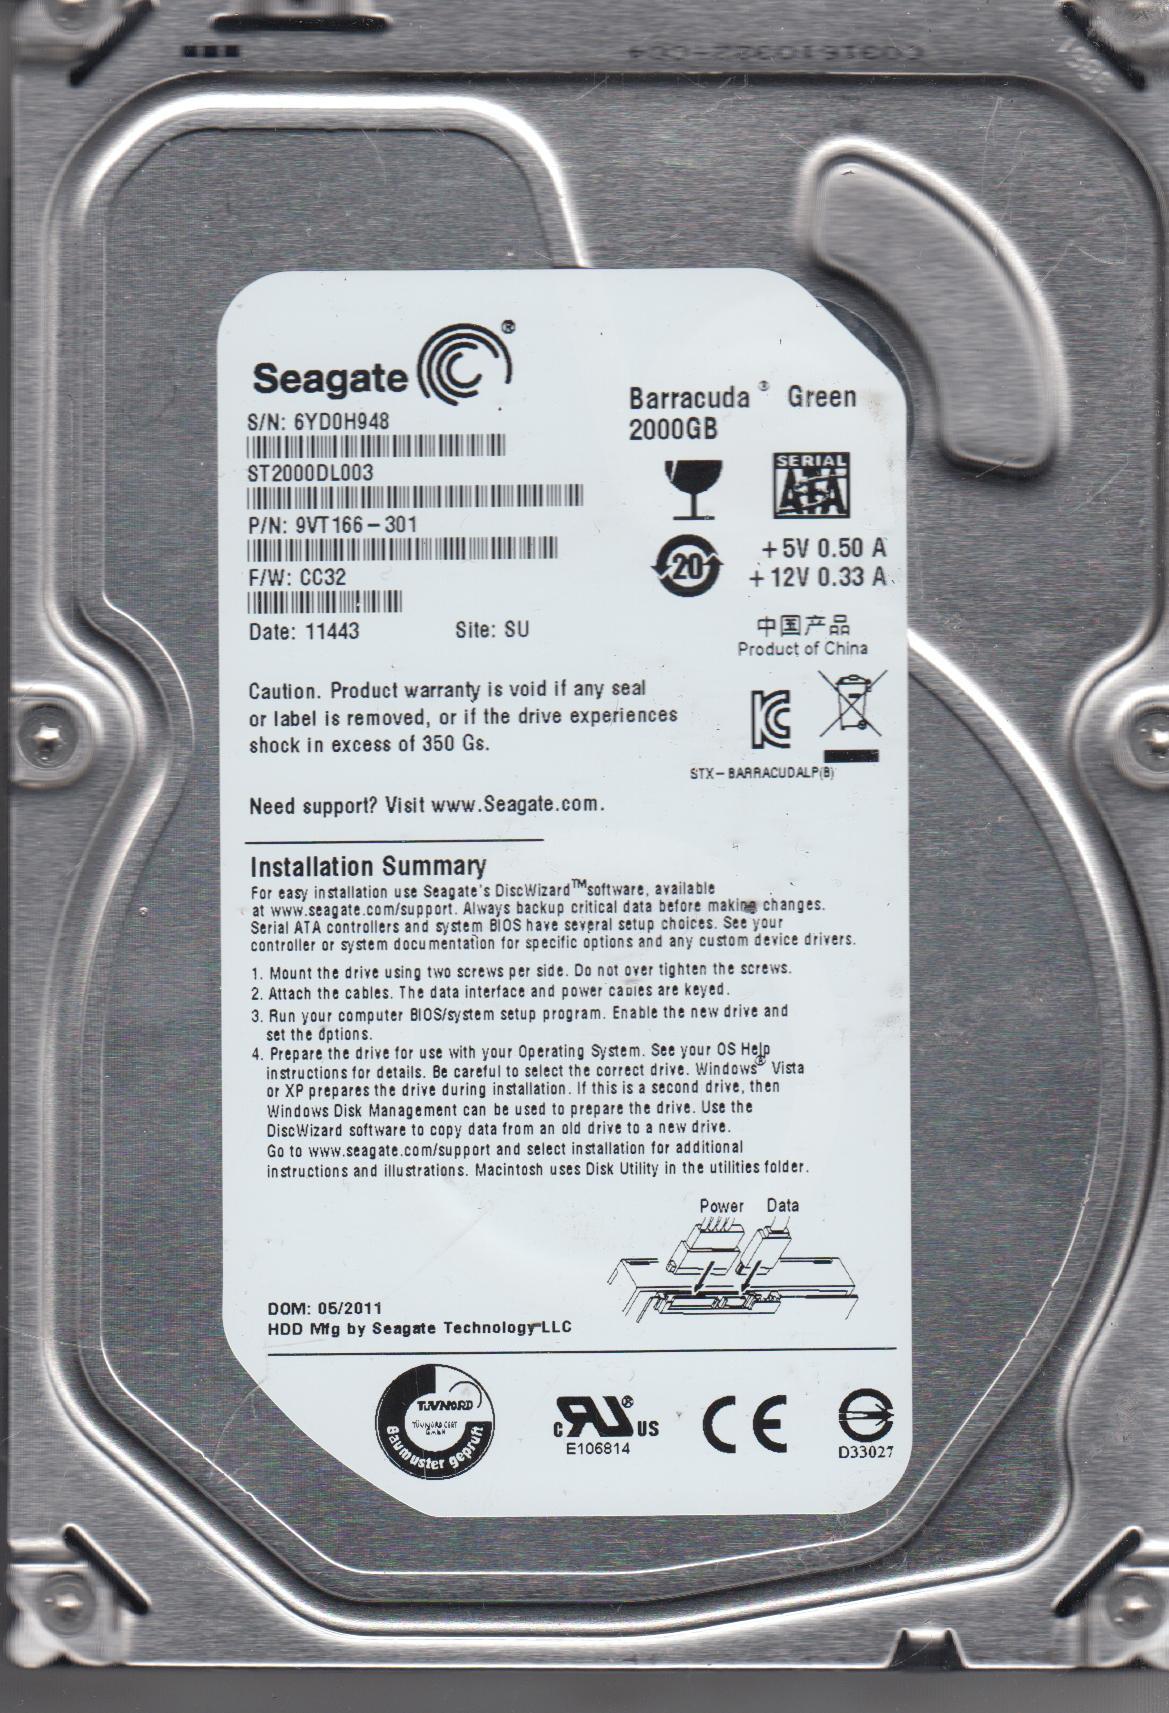 ST2000DL003, 6YD, SU, PN 9VT166-301, FW CC32, Seagate 2TB SATA 3.5 Hard Drive by Seagate